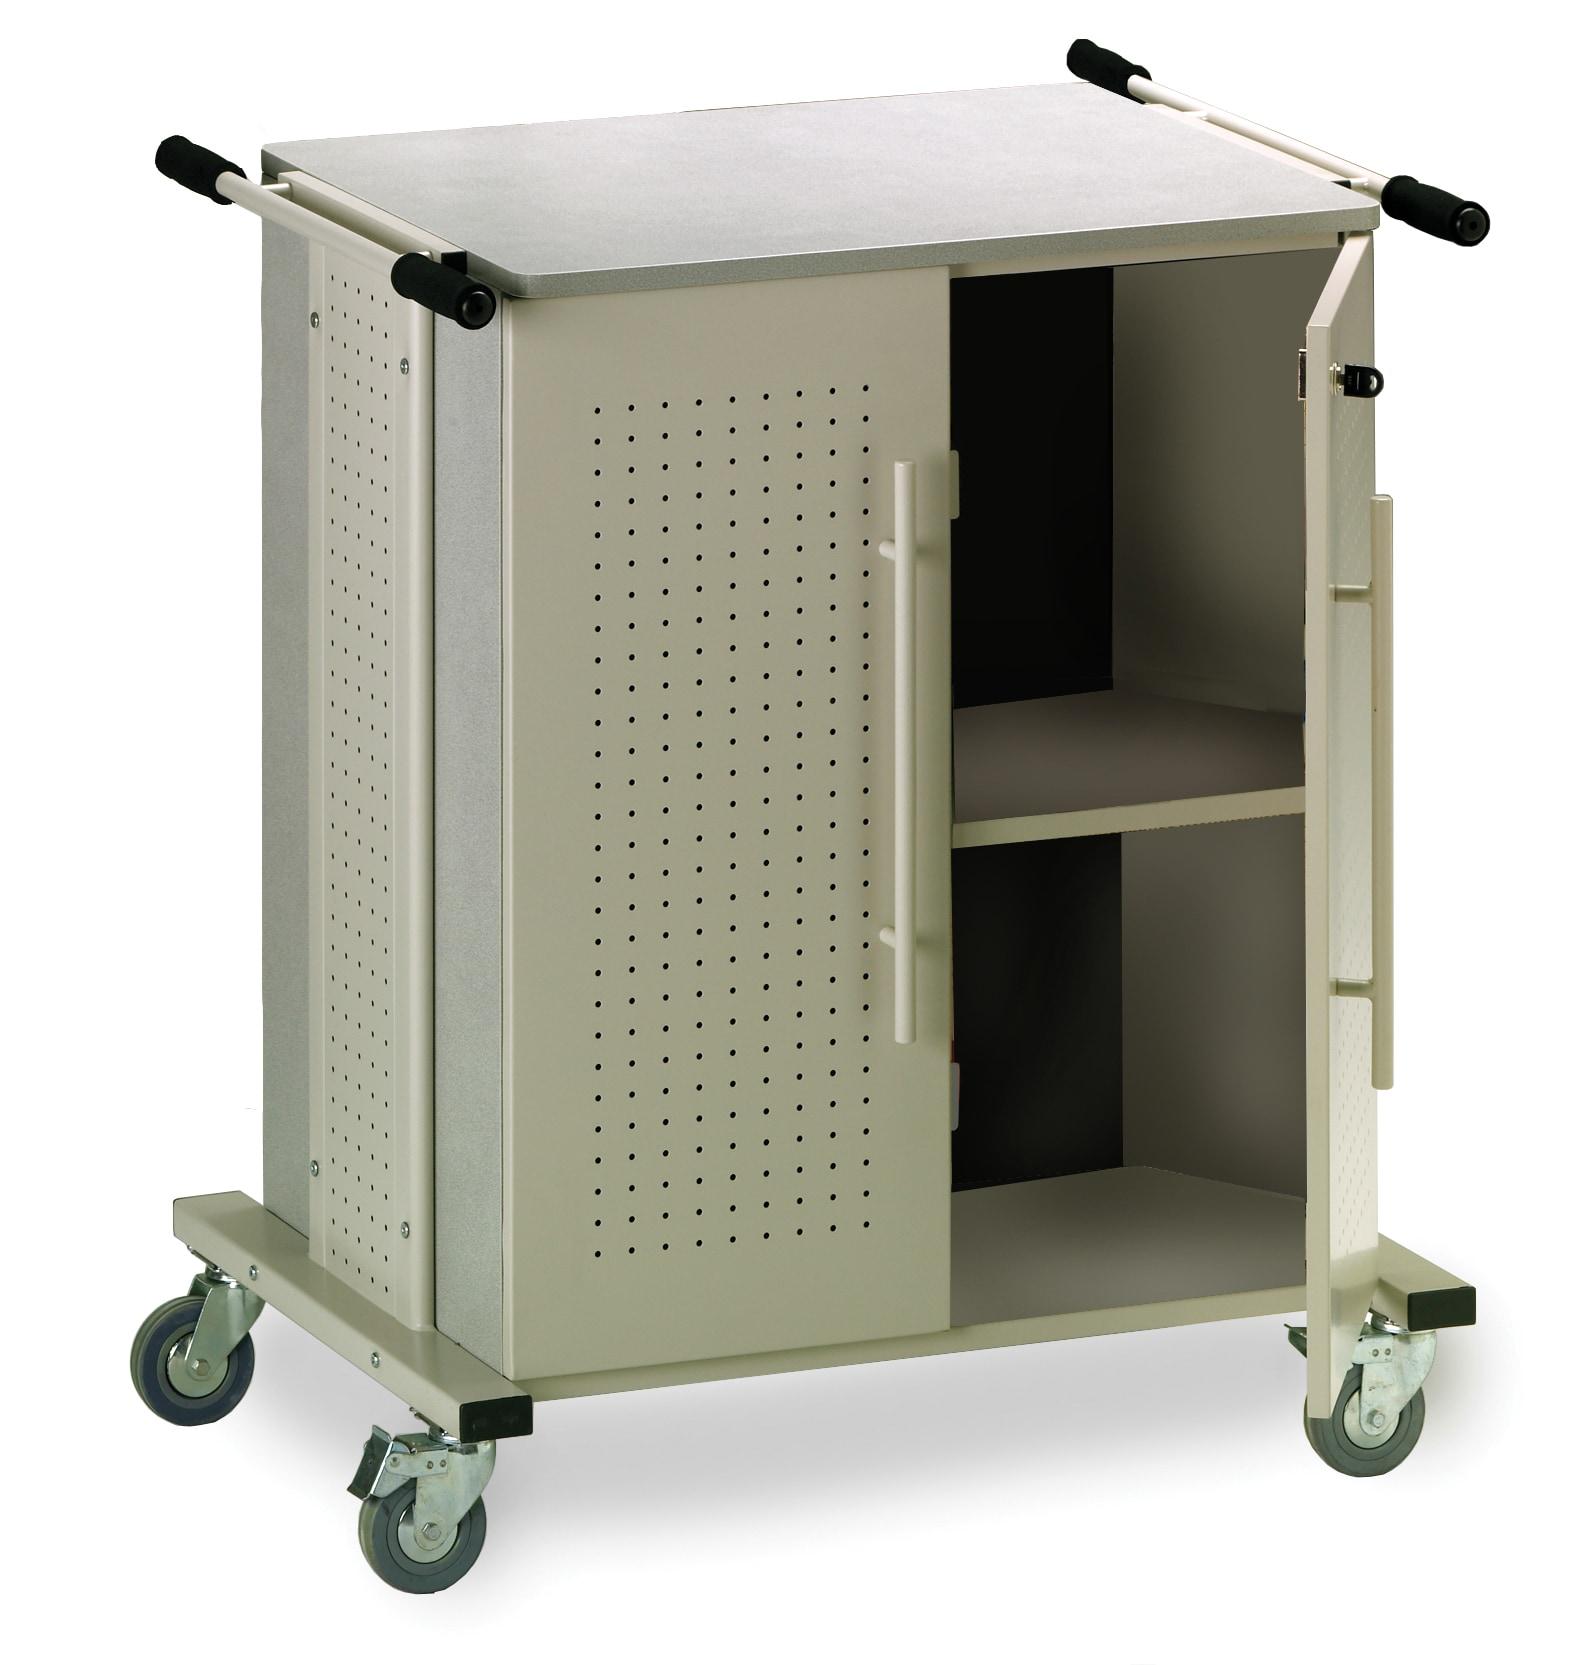 Kwikfile/ Mayline Heavy-duty Mobile X-ray Storage Cart